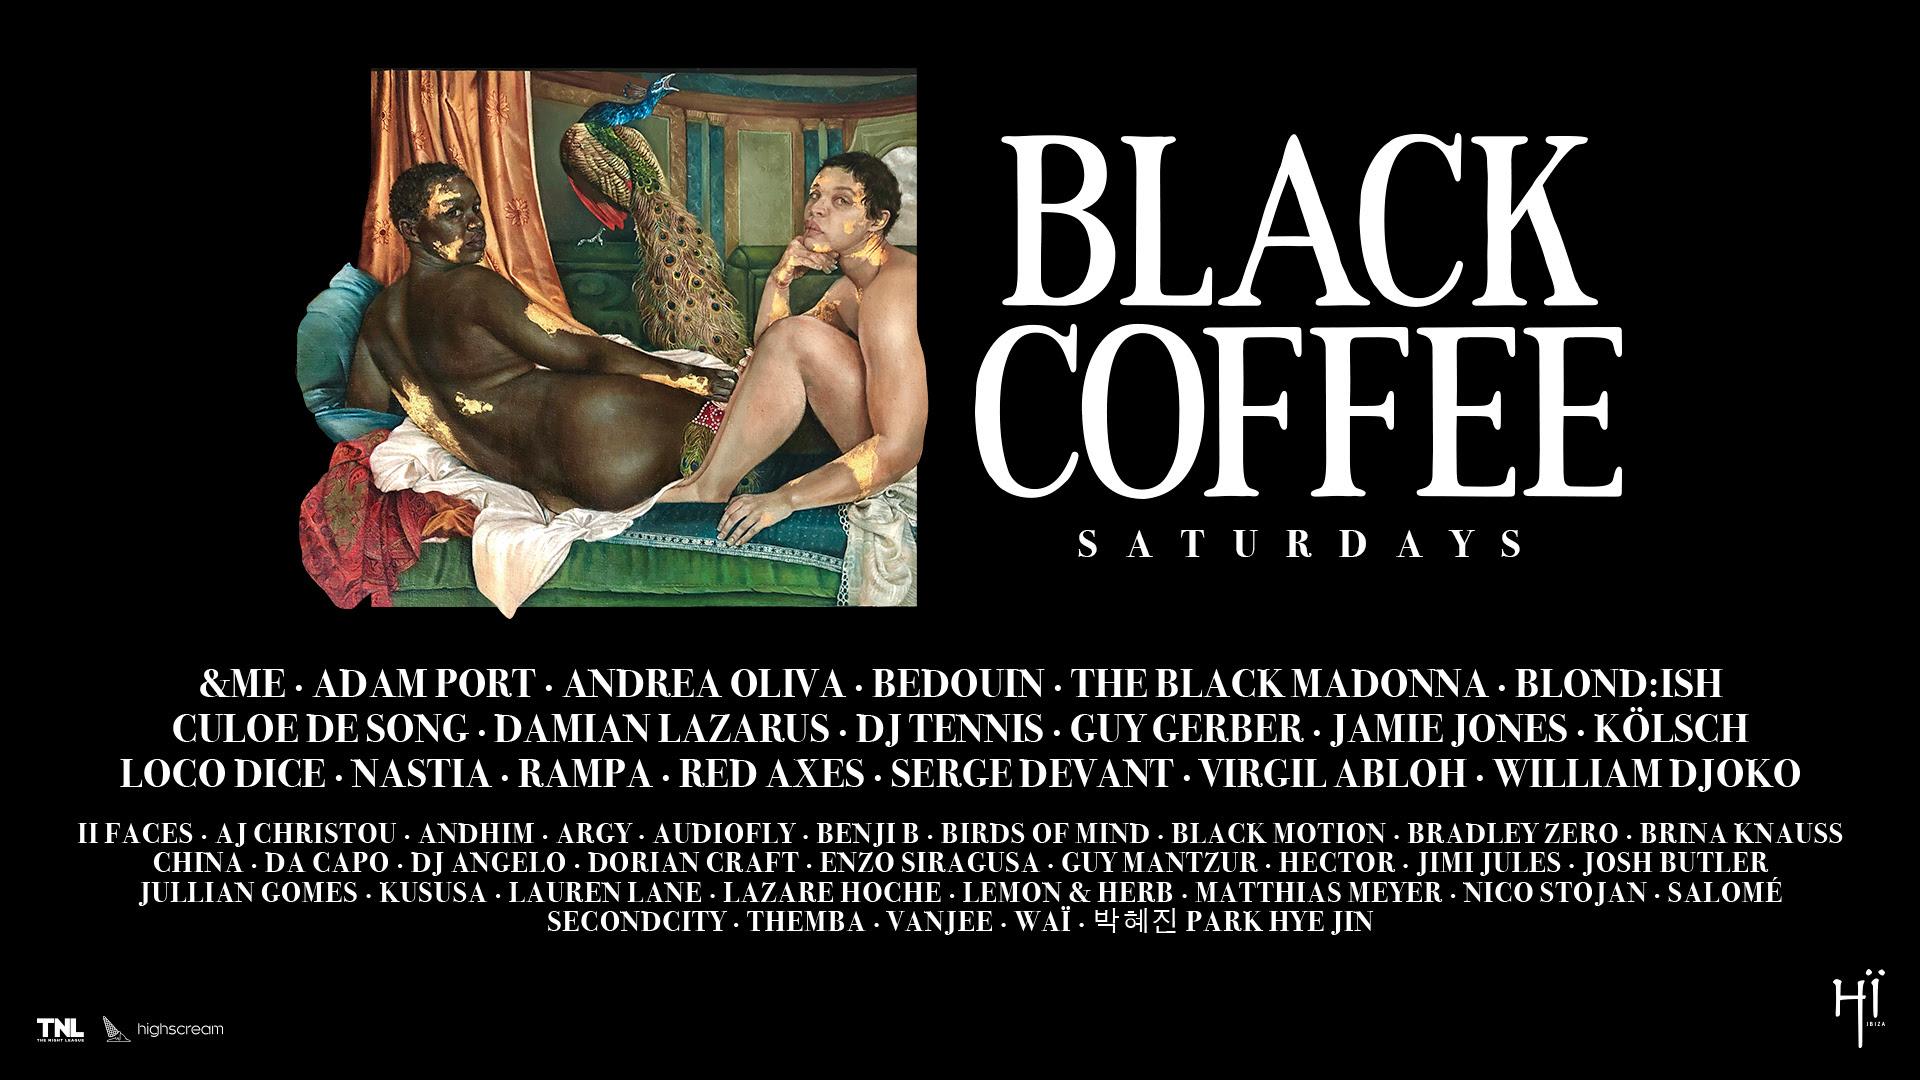 HÏ IBIZA ANNOUNCES FULL SEASON LINE-UP FOR BLACK COFFEE BLACK COFFEE